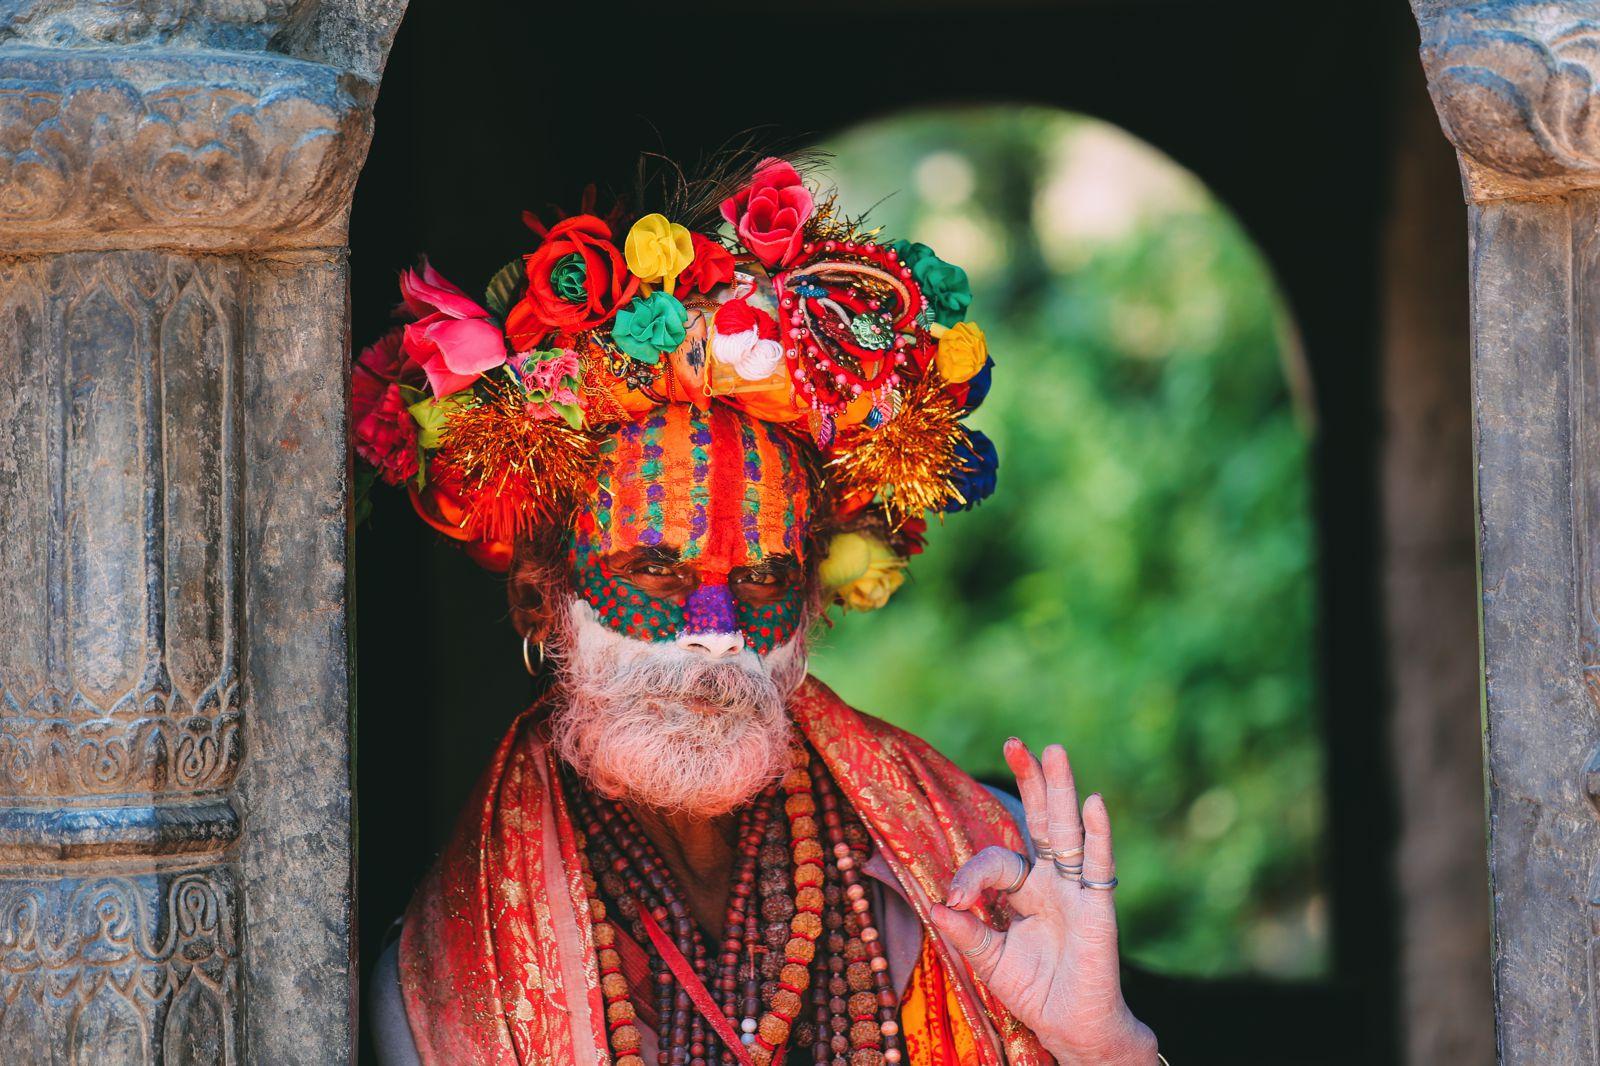 Photos And Postcards From Nepal... Chitwan, Kathmandu, Bhaktapur, Panauti, Pokhara, Tansen, Palpa, Lumbini (30)